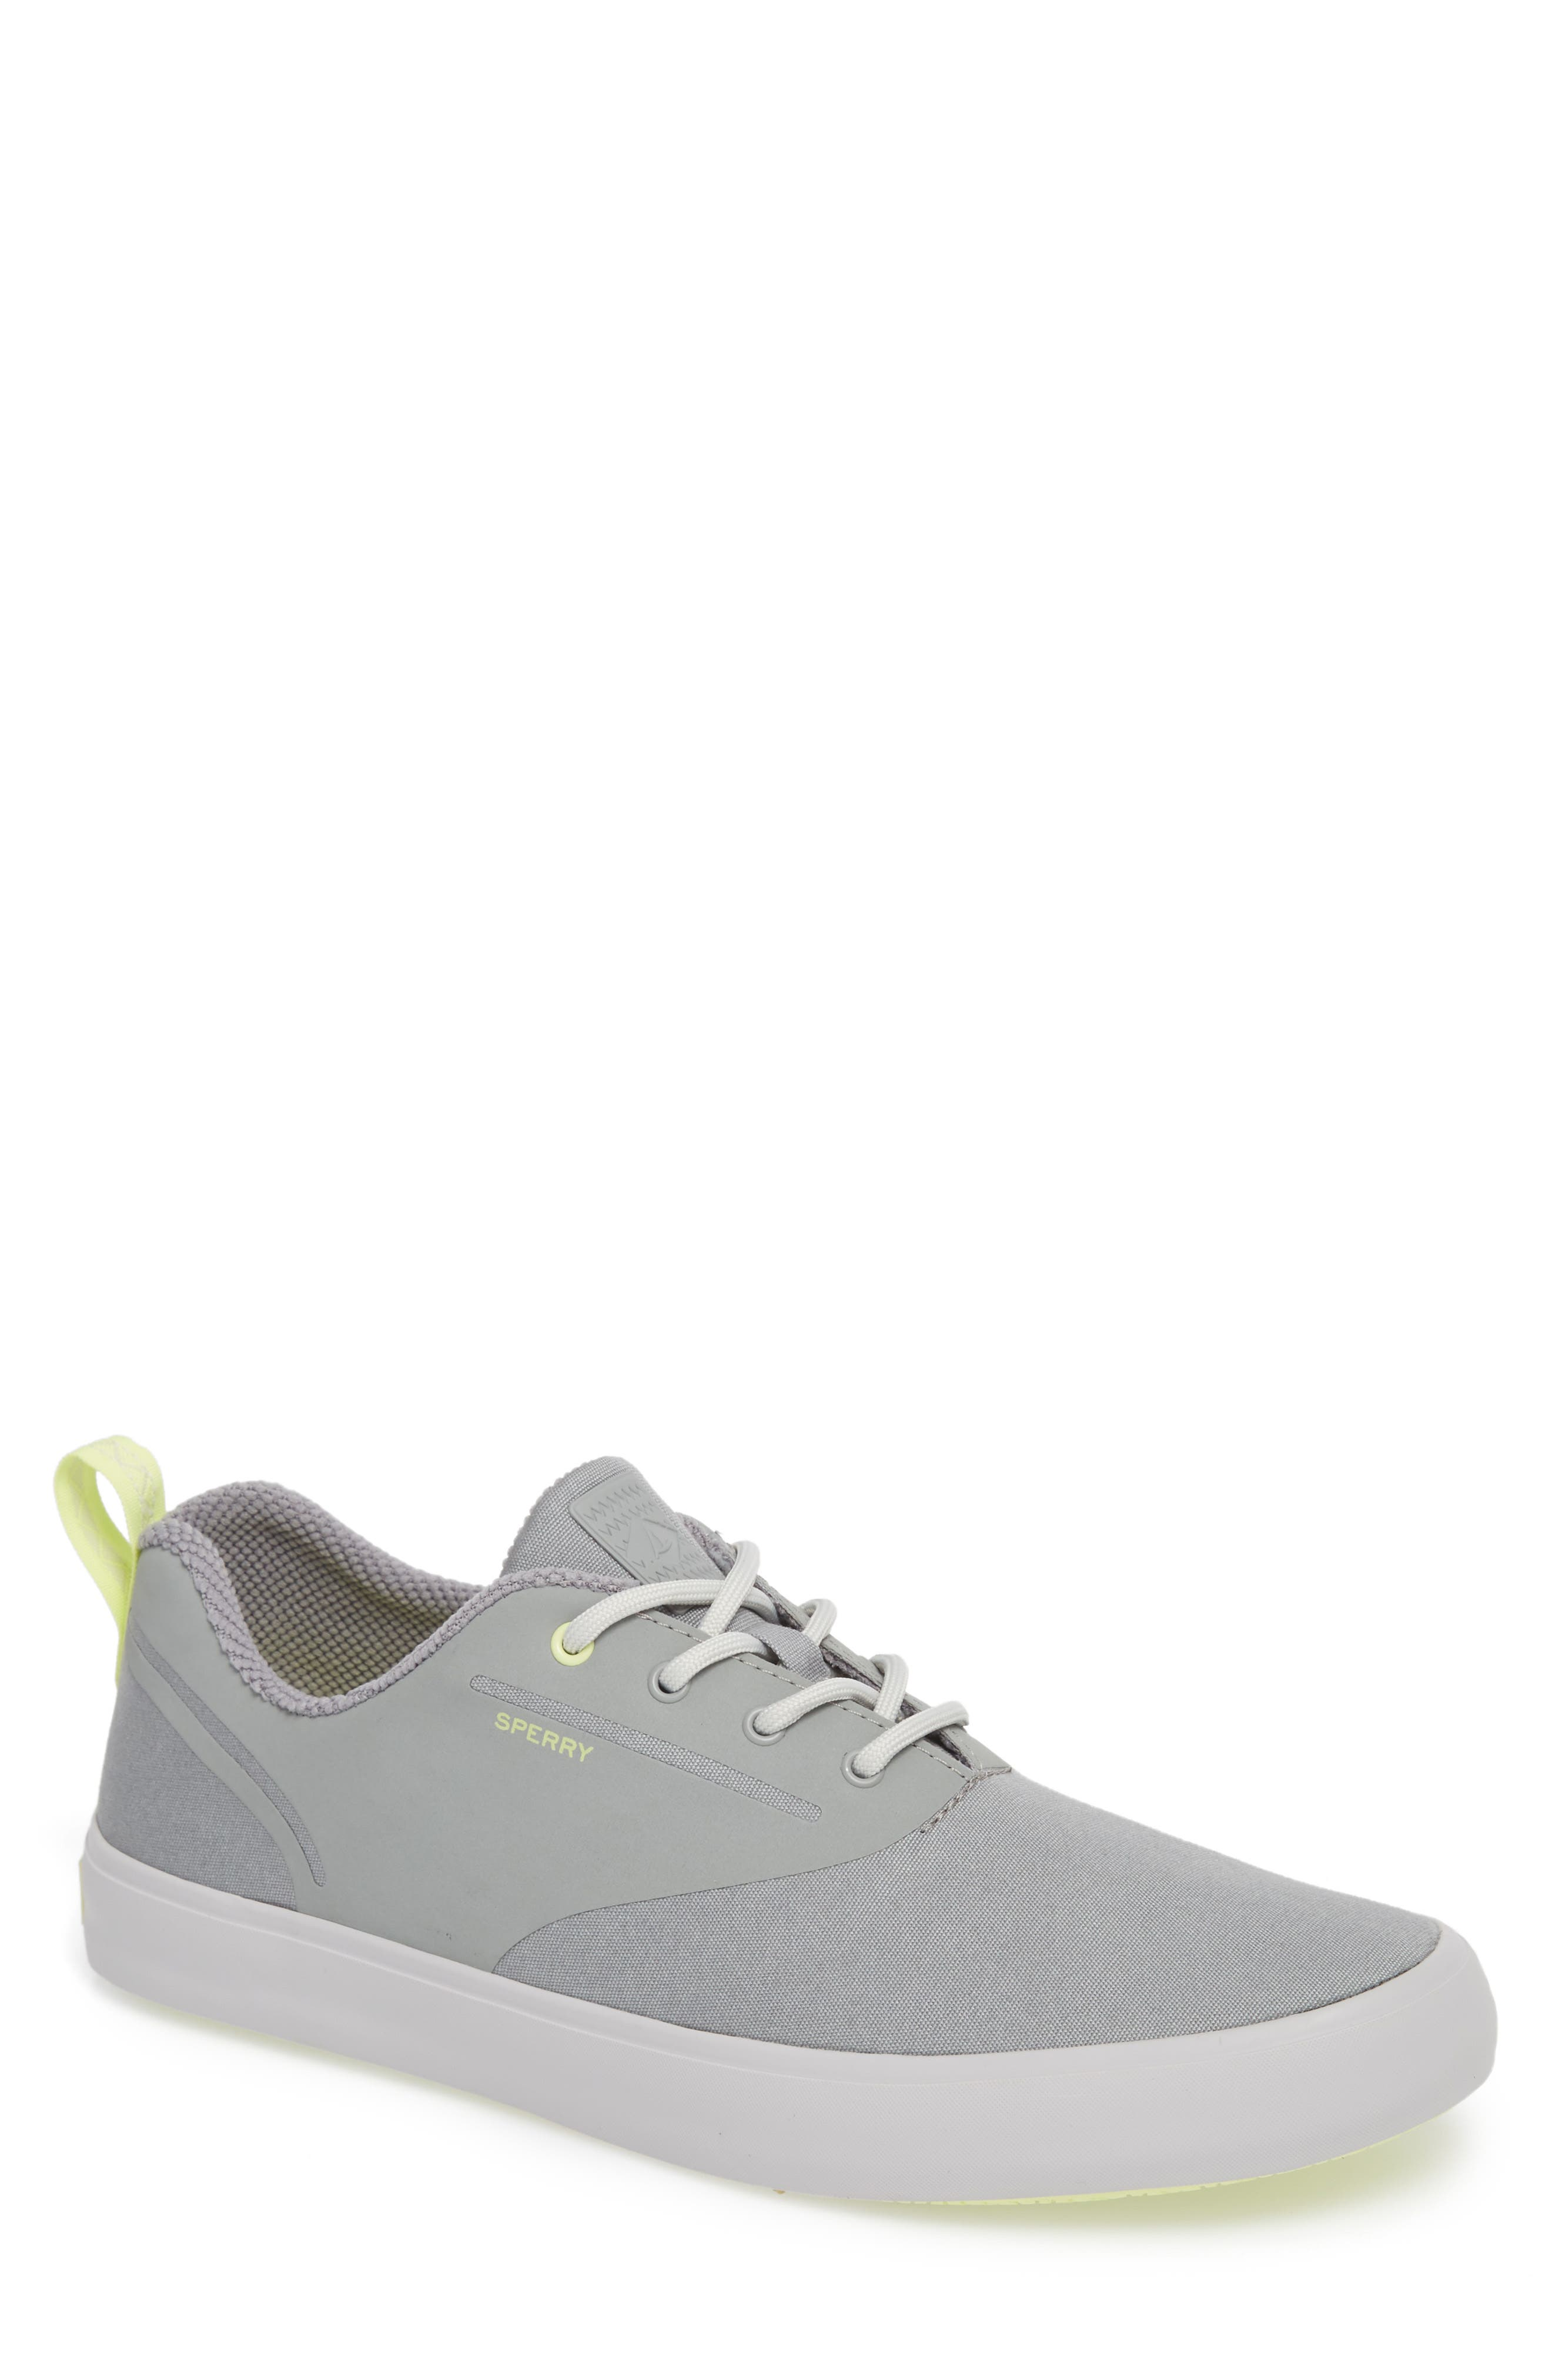 Sperry Flex Deck CVO Sneaker (Men)